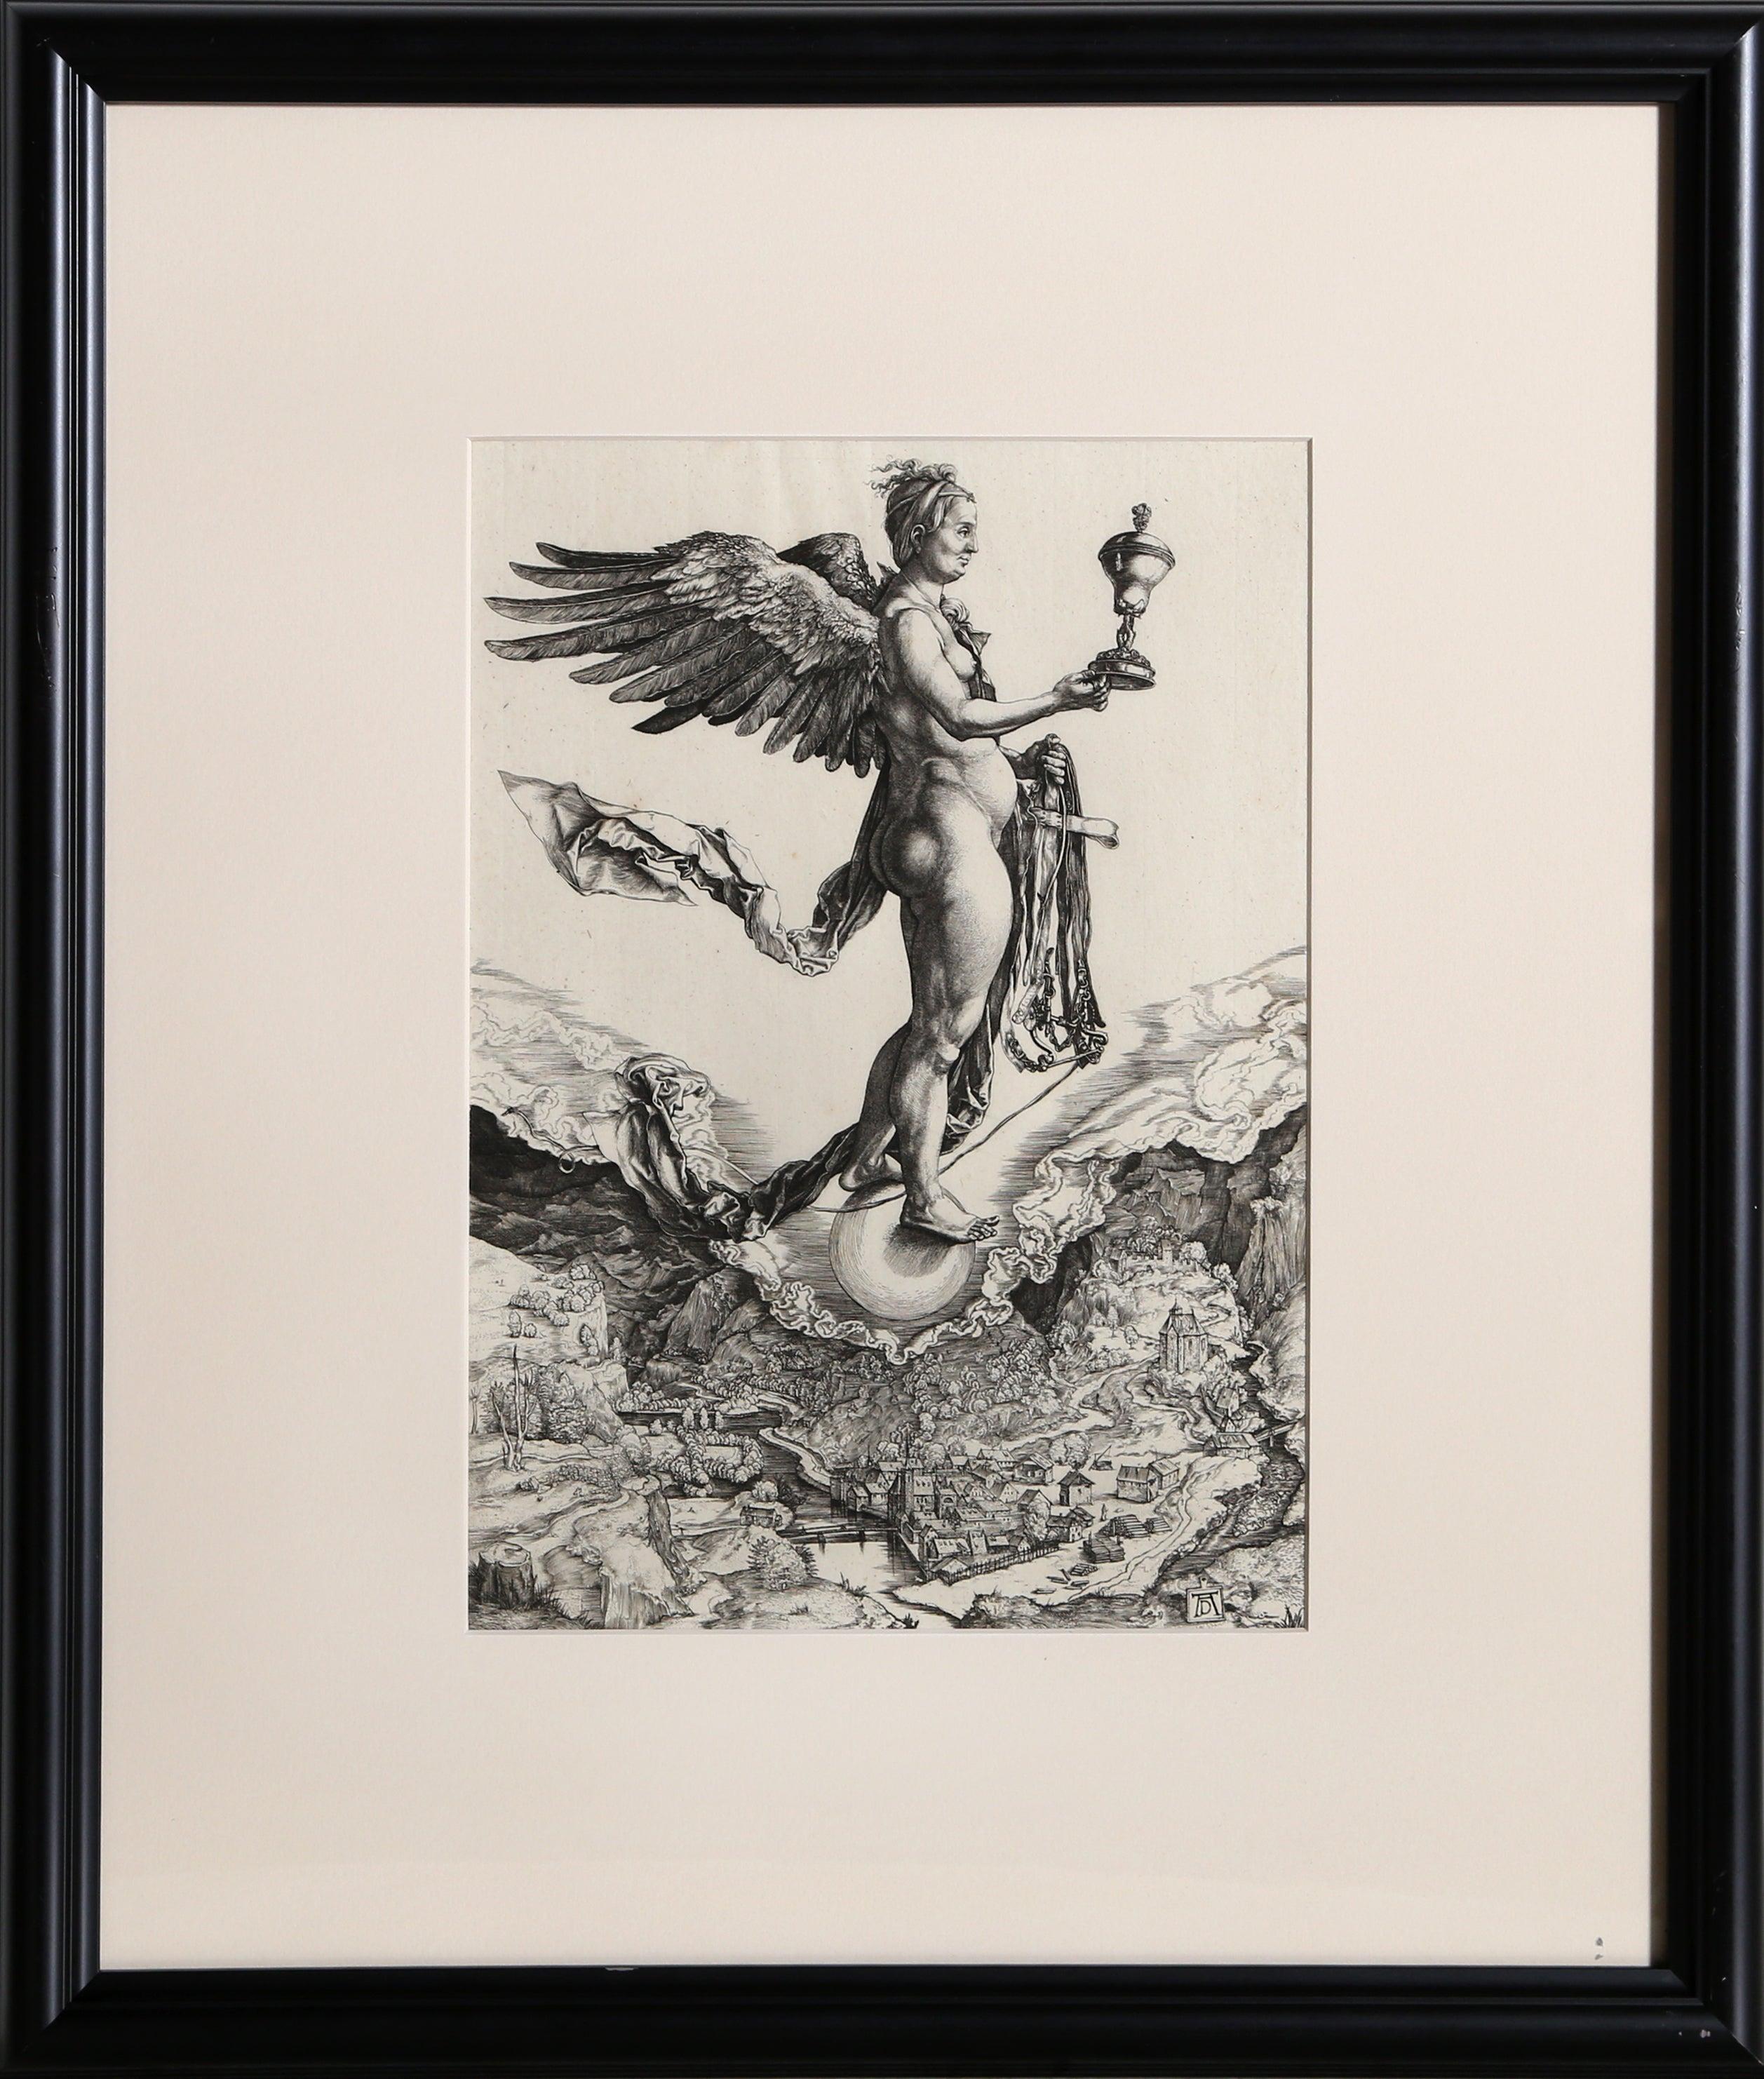 La Grande Fortune etching by Amand-Durand after Albrecht Durer